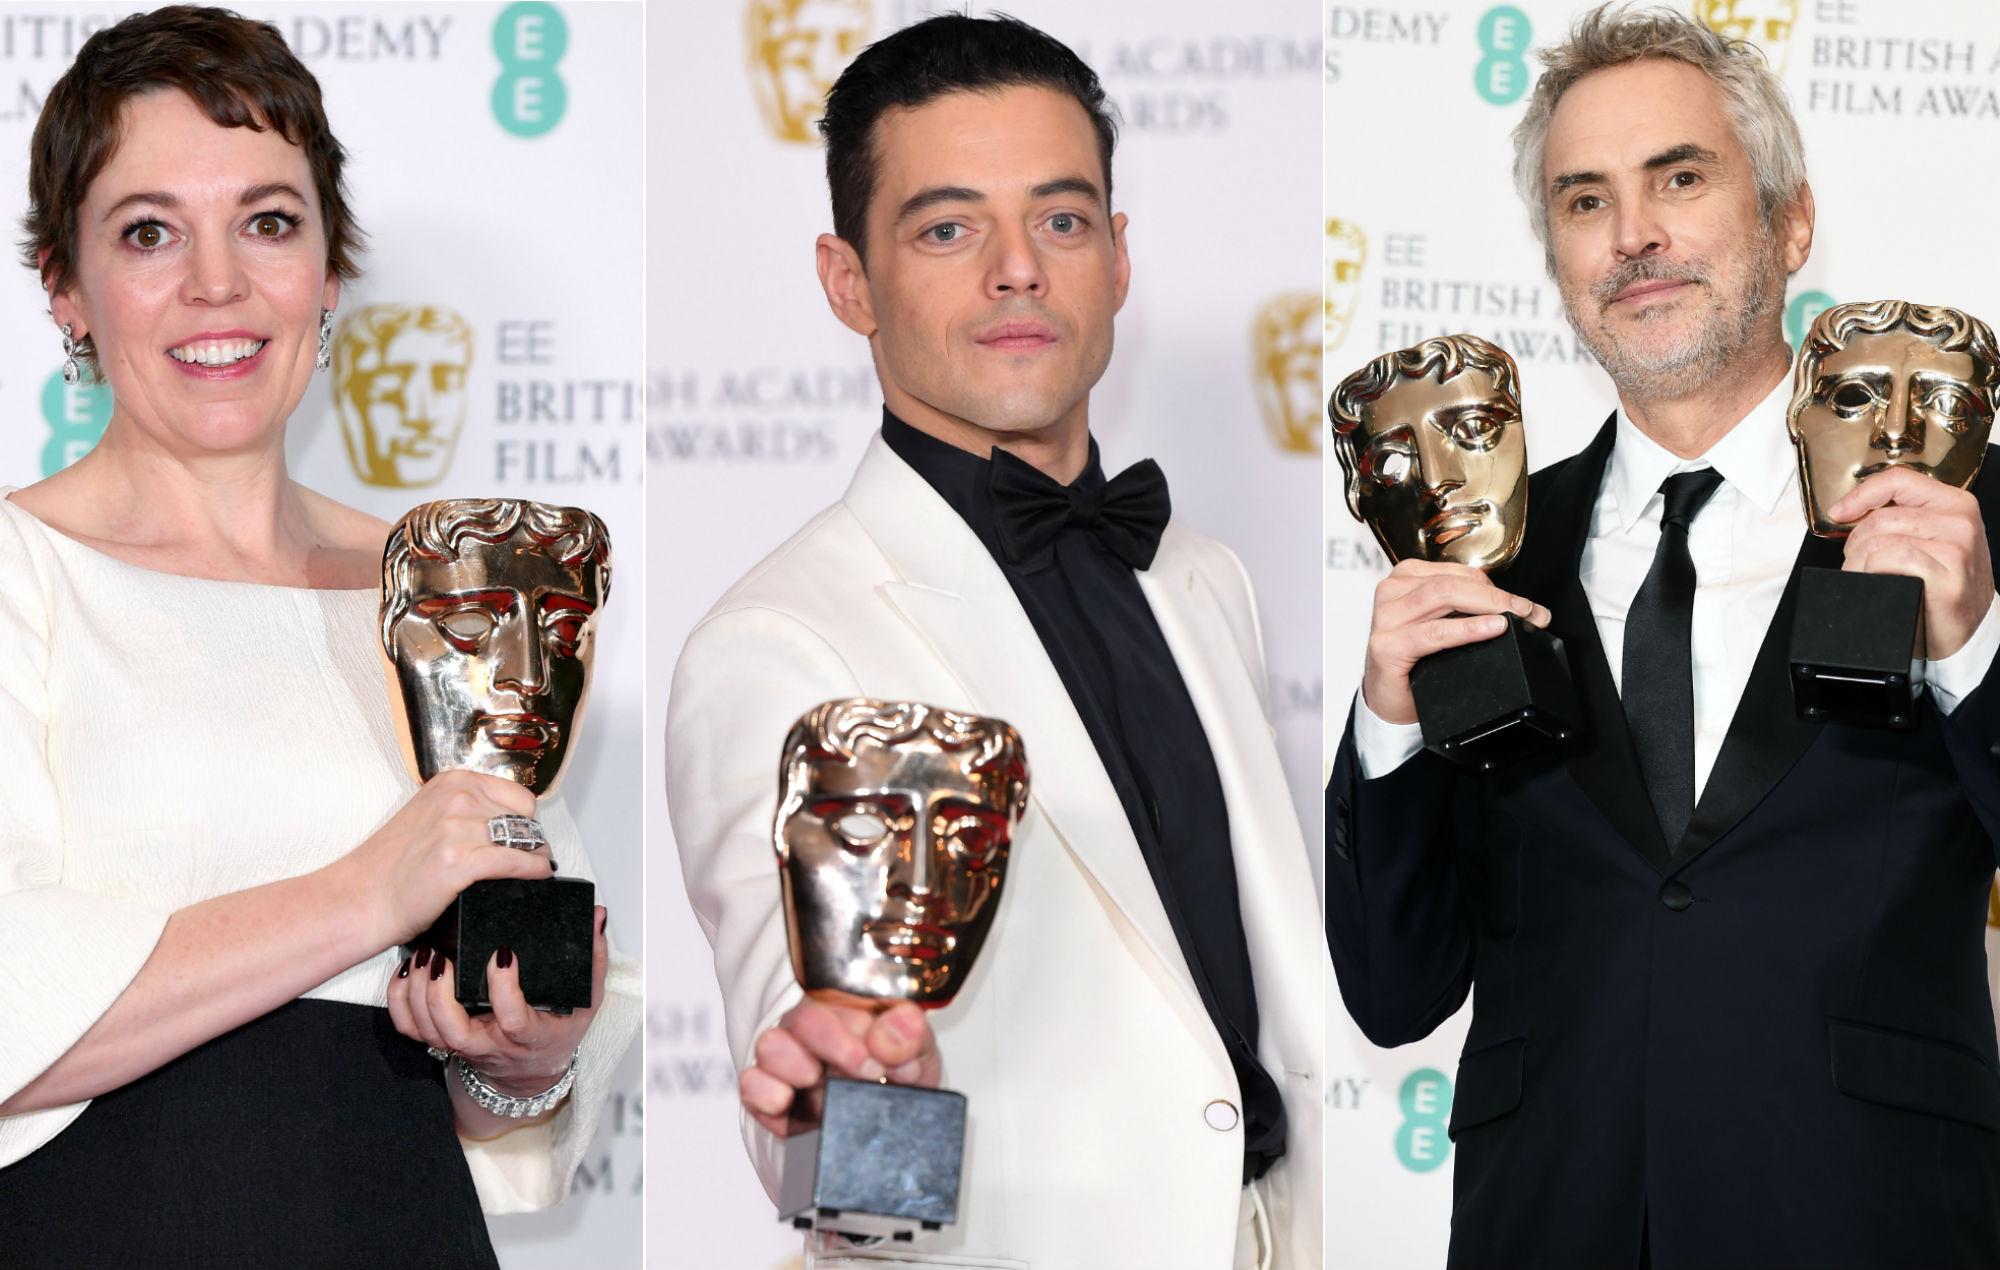 Bafta Winners 2019: Here Are All The Winners Of The 2019 BAFTAs